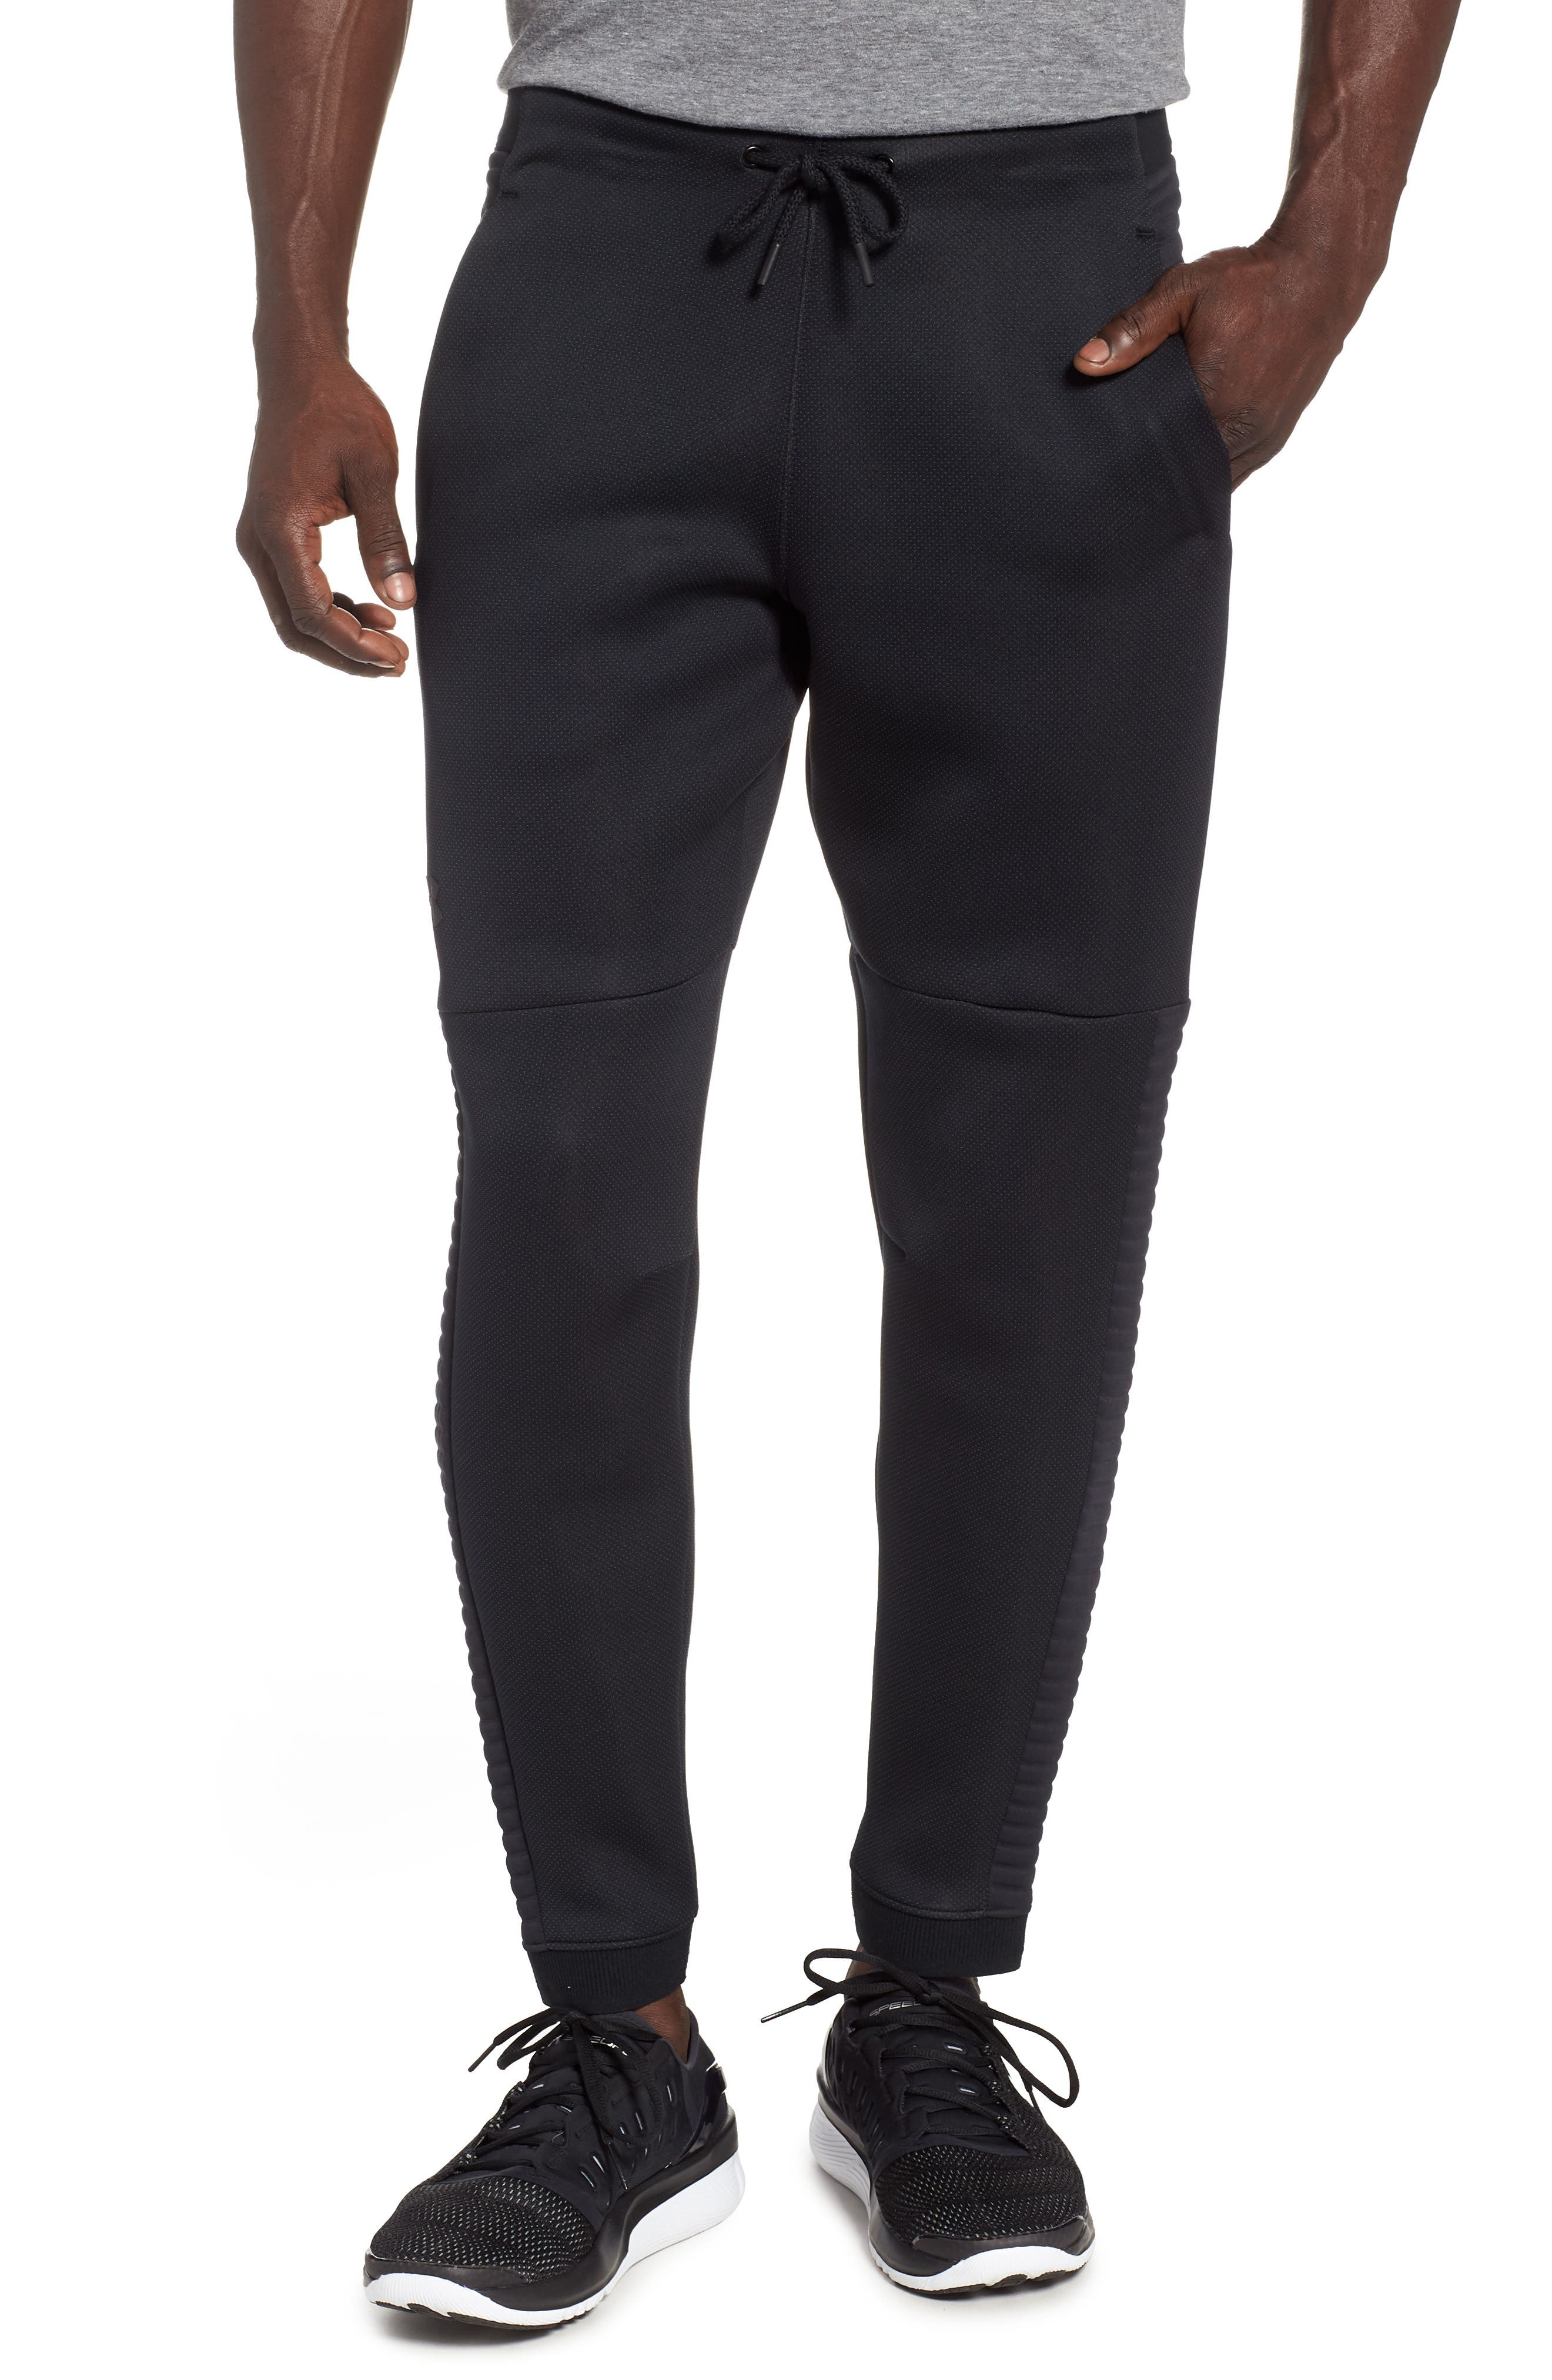 Unstoppable Move Airgap Pants,                             Main thumbnail 1, color,                             BLACK/ CHARCOAL/ BLACK